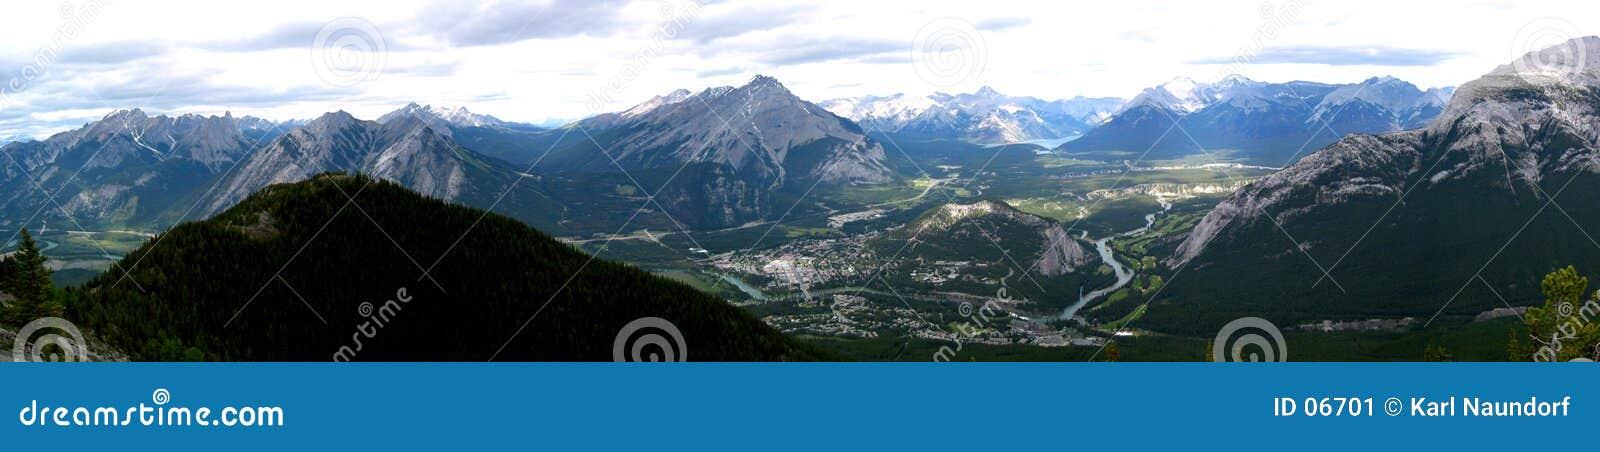 Montagna del Banff Townsite panoramica